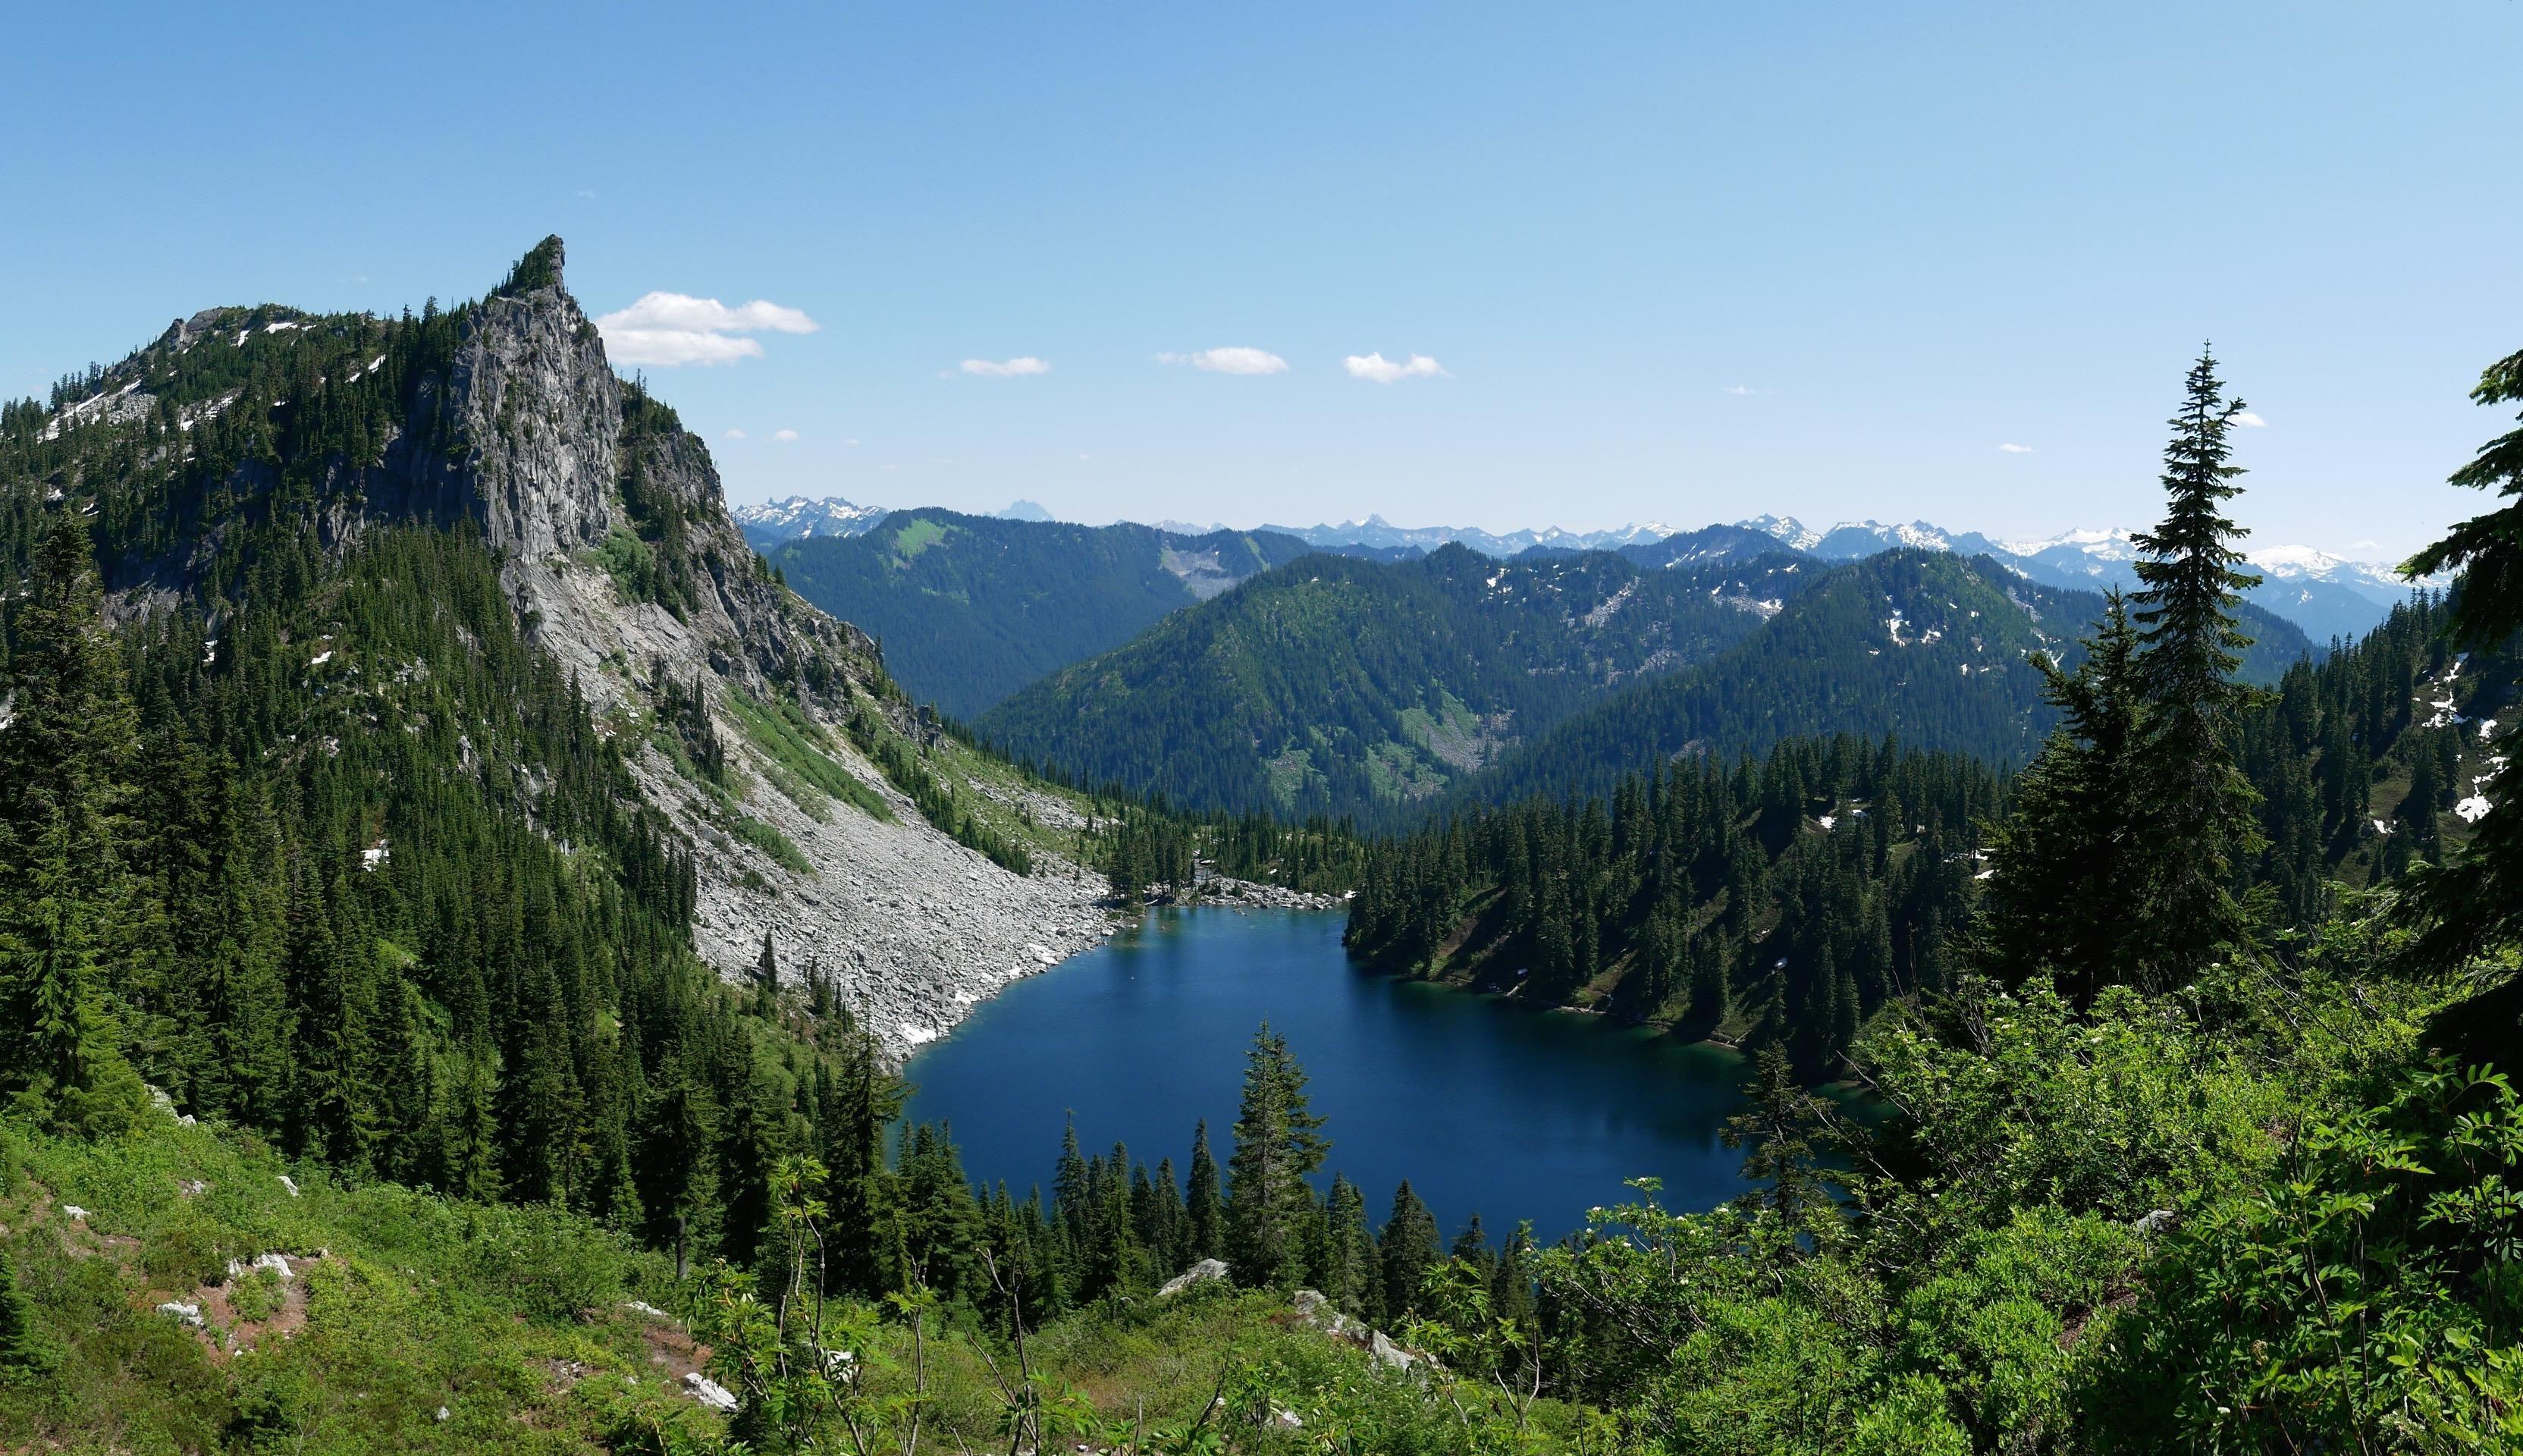 Views Of Valhalla Lake Valhalla That Is Mount Mccausland Trail Central Cascades Washington State Usa Hiking Camping Outdoors Nat Lake Valhalla Hiking